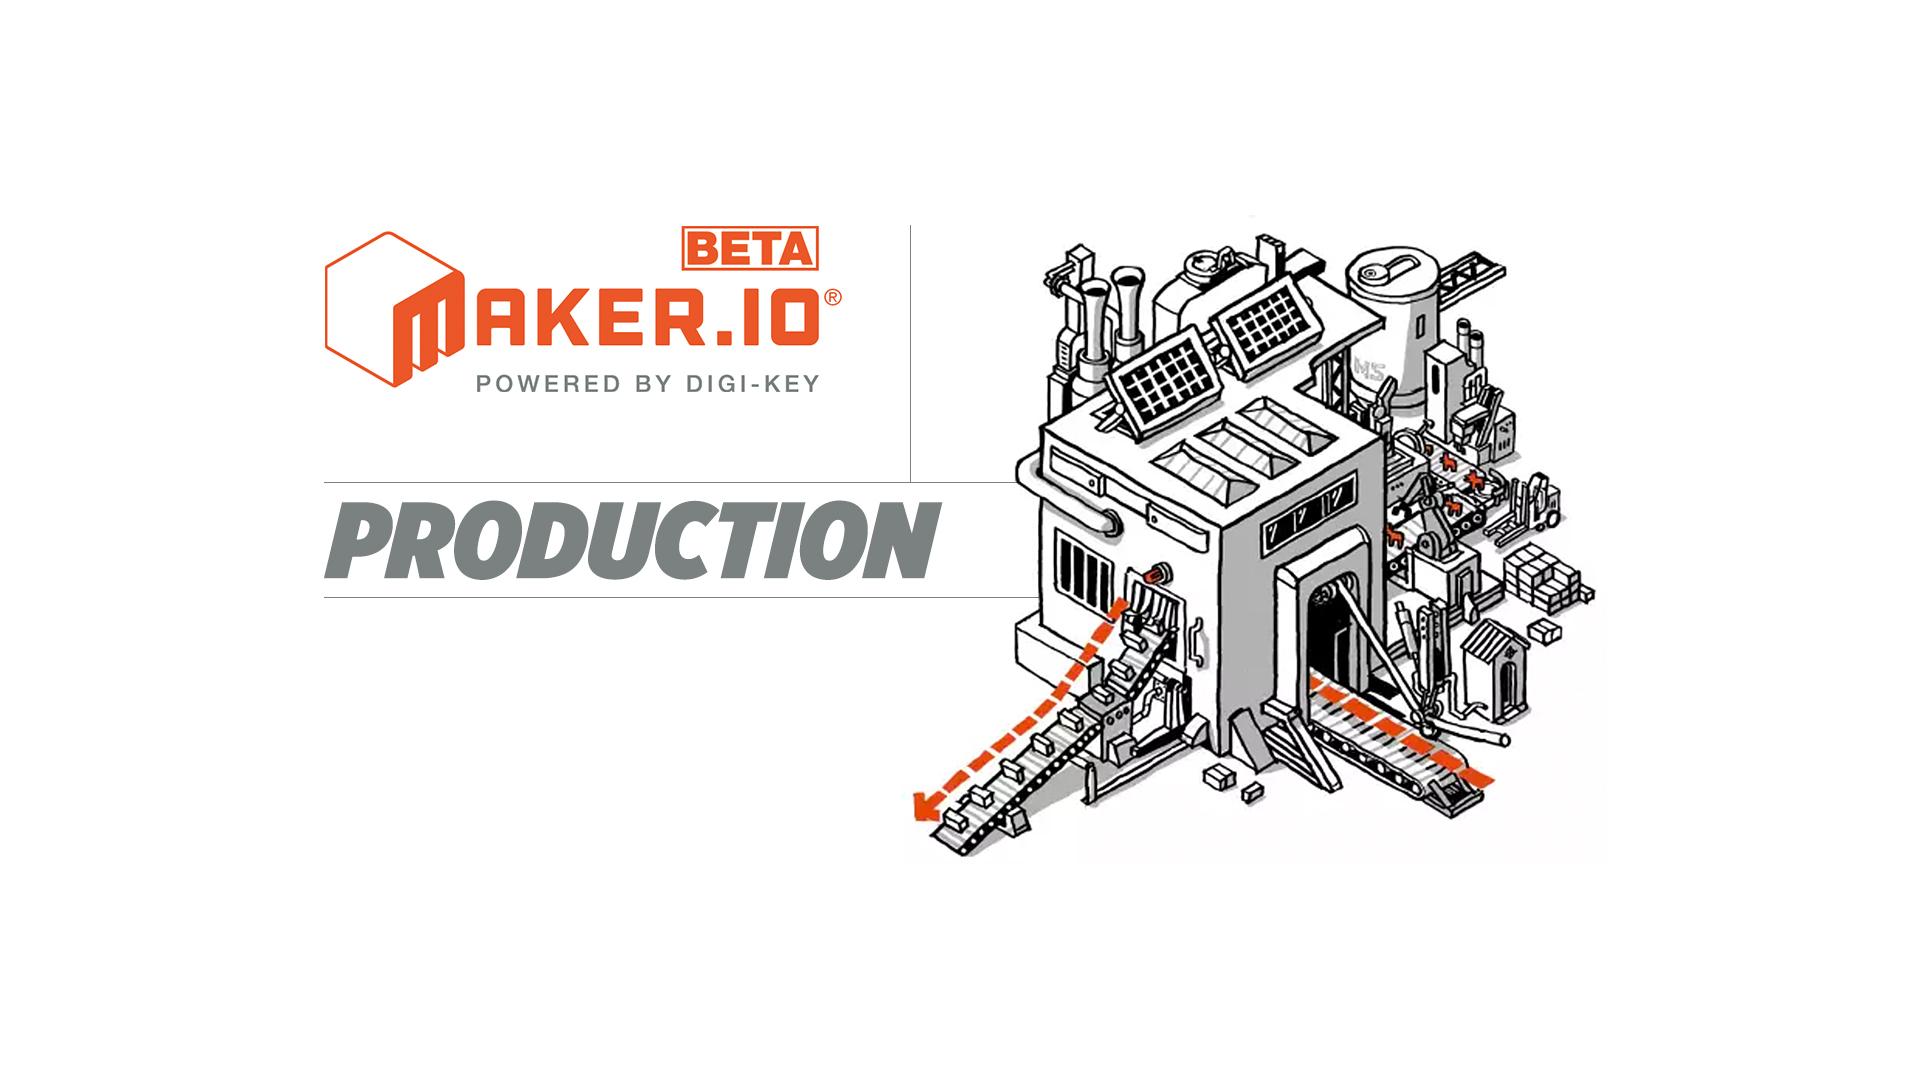 adafruit_maker_io_digikey_video_production